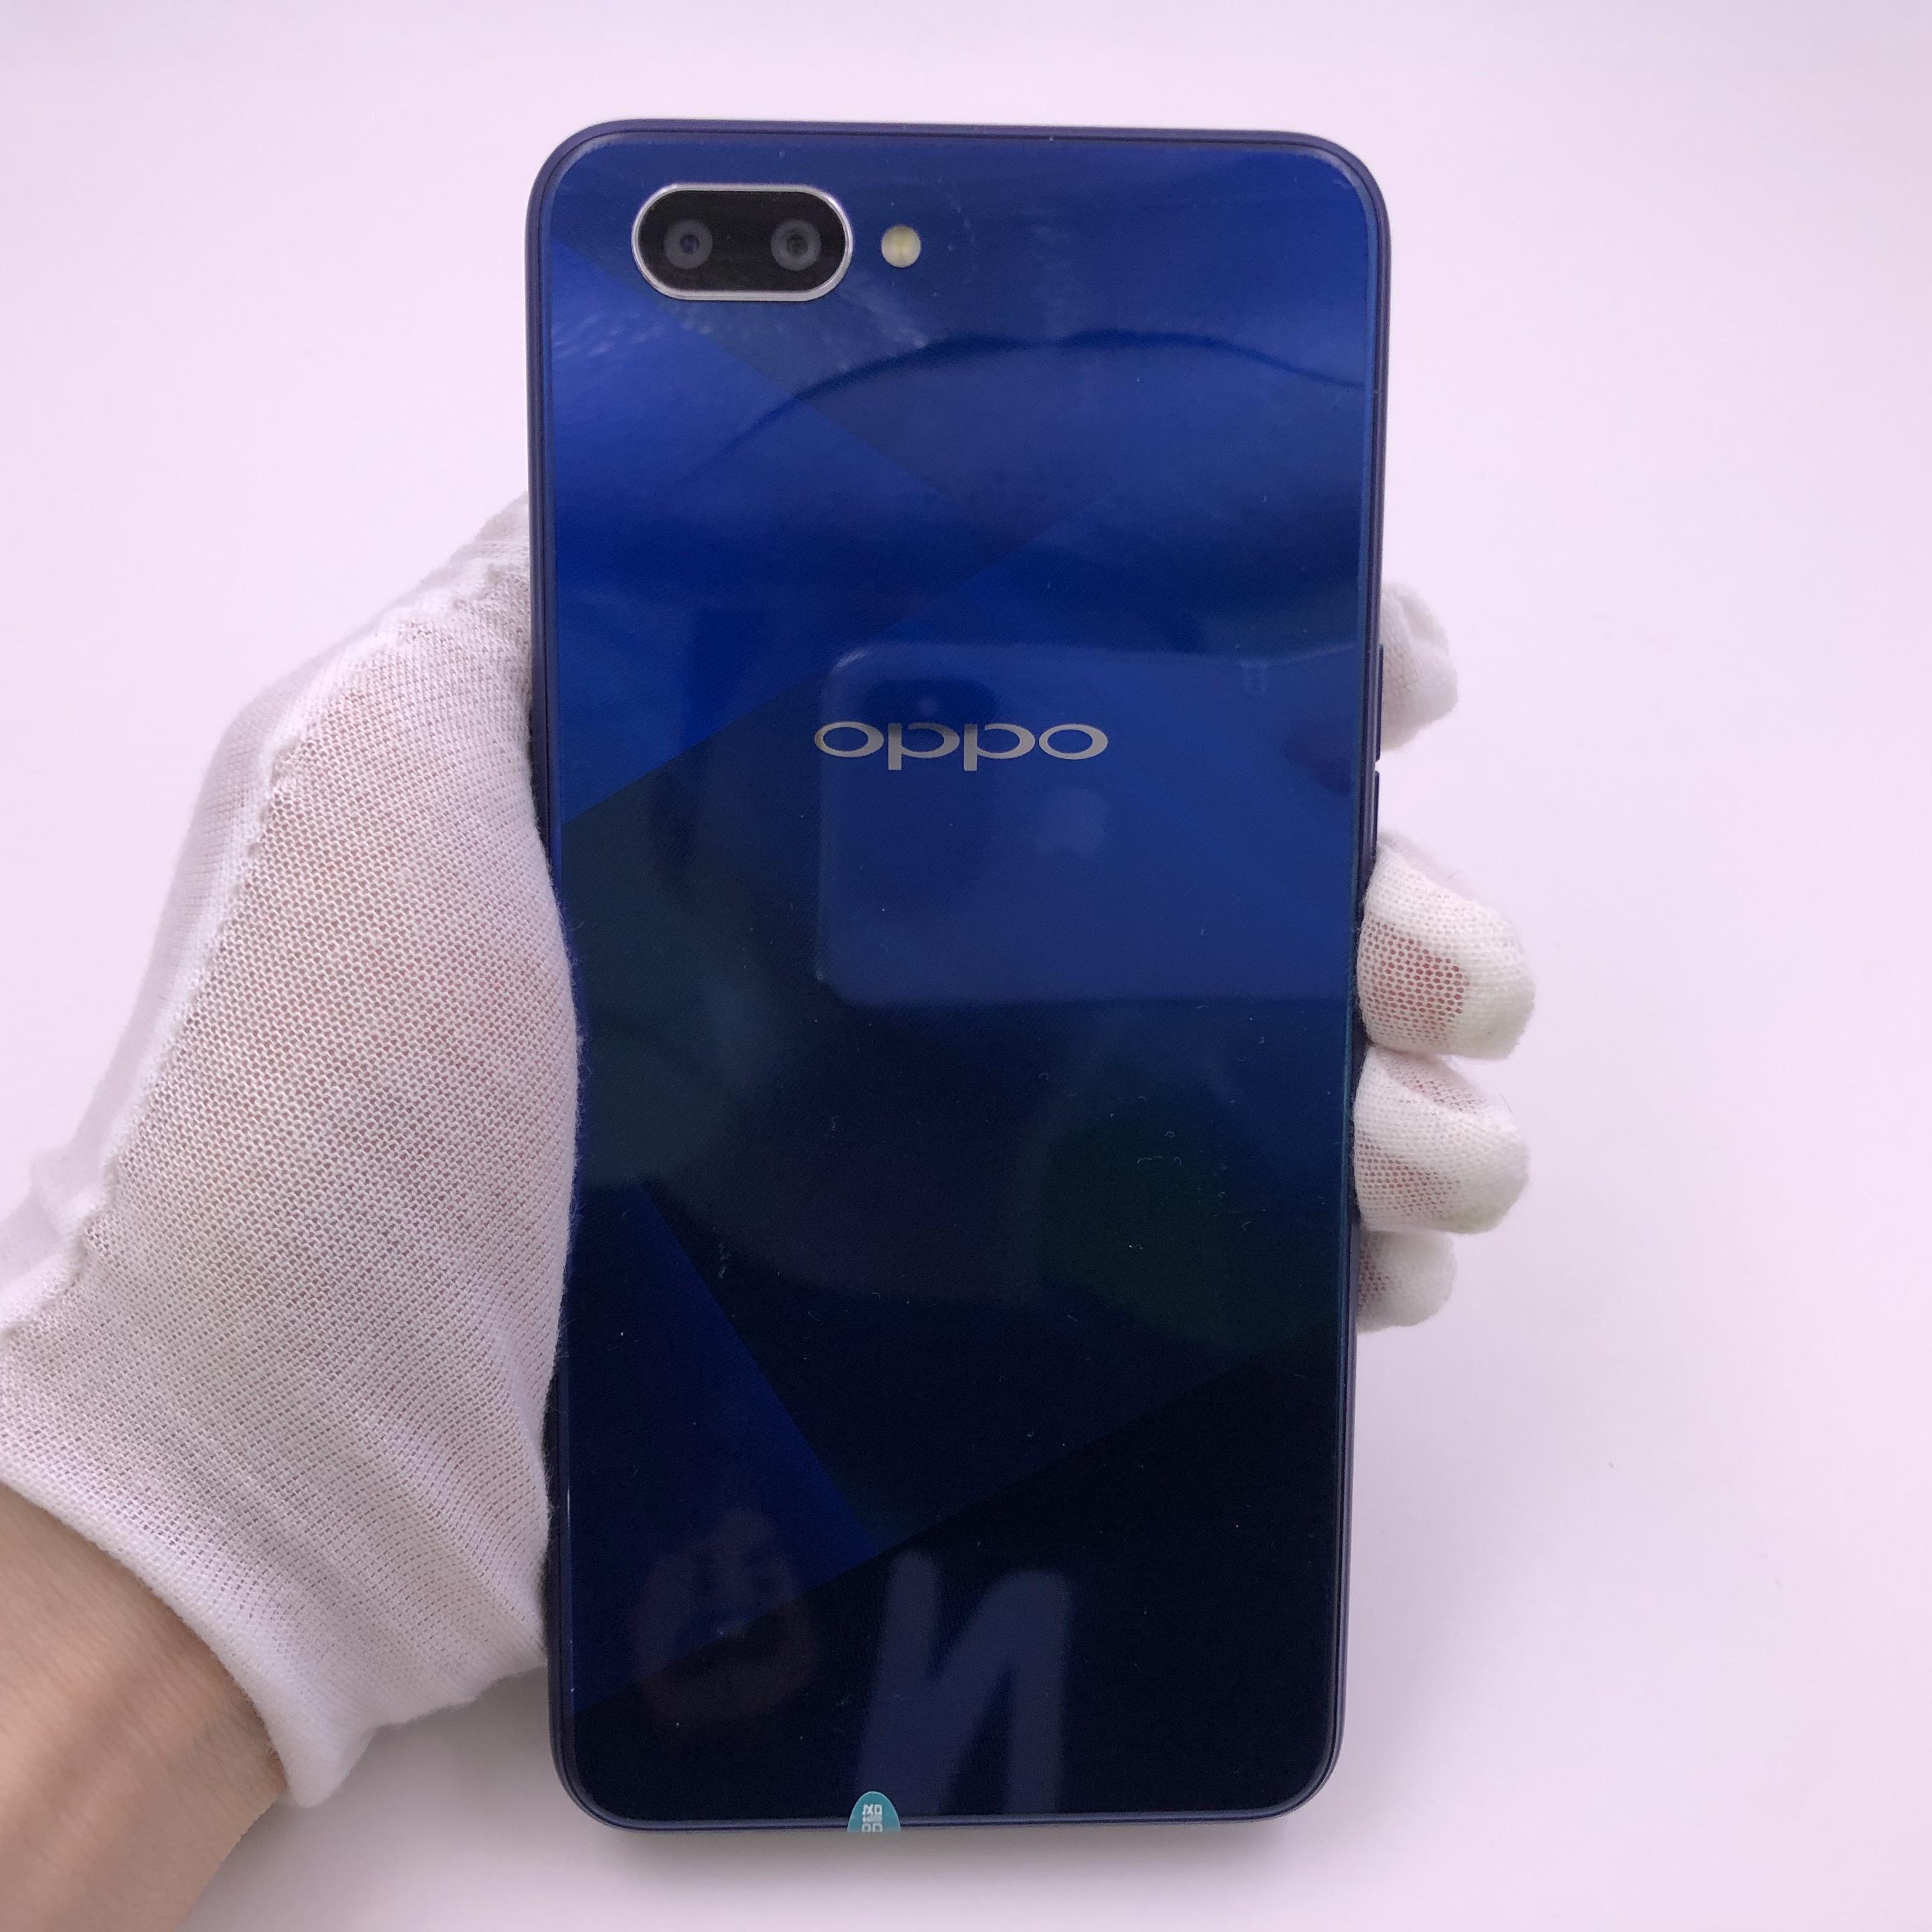 oppo【A5】4G全网通 蓝色 3G/64G 国行 8成新